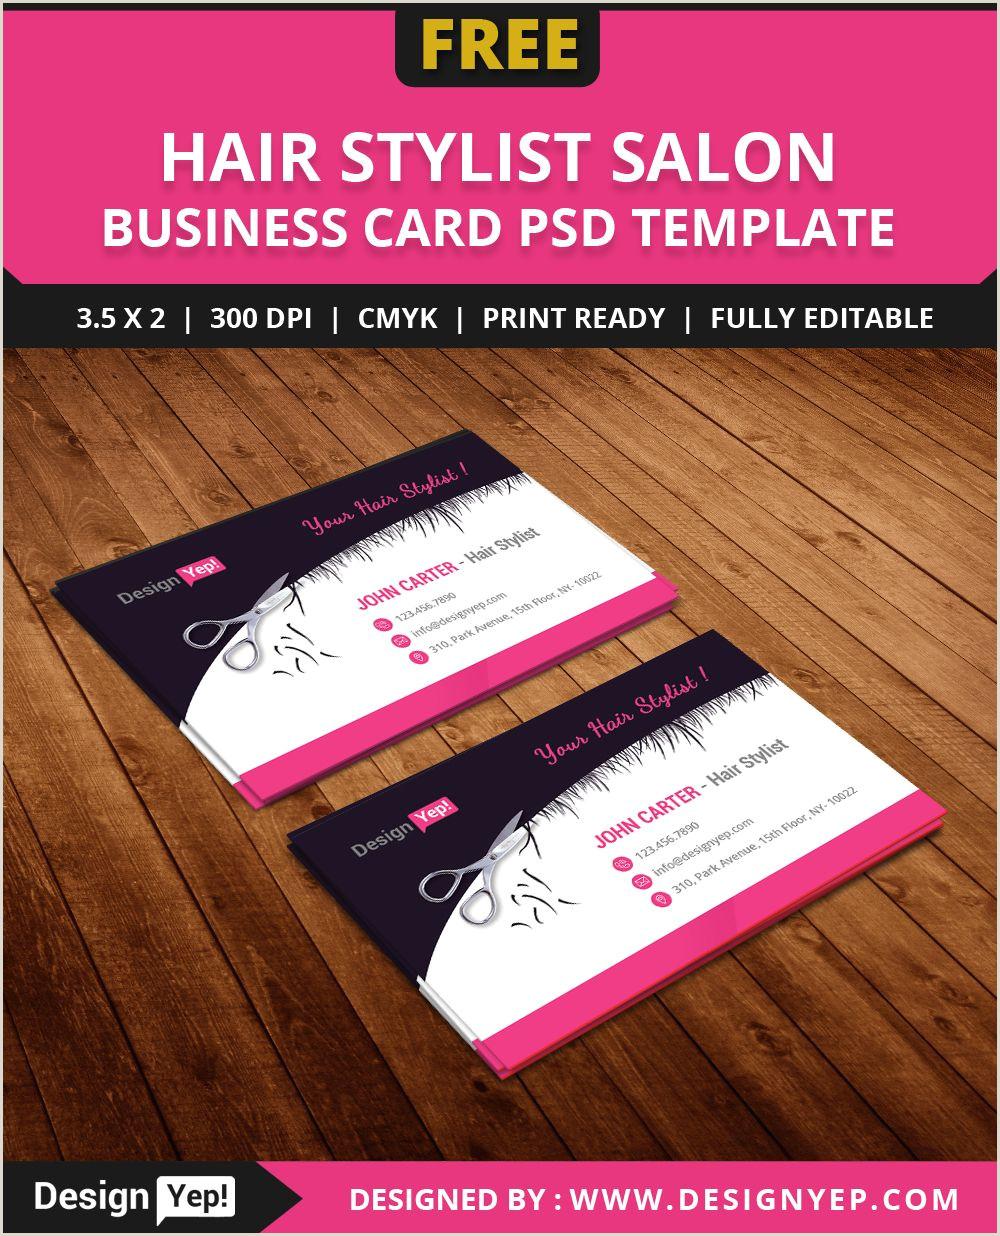 Unique Haircut Templates For Business Cards Free Hair Stylist Salon Business Card Template Psd